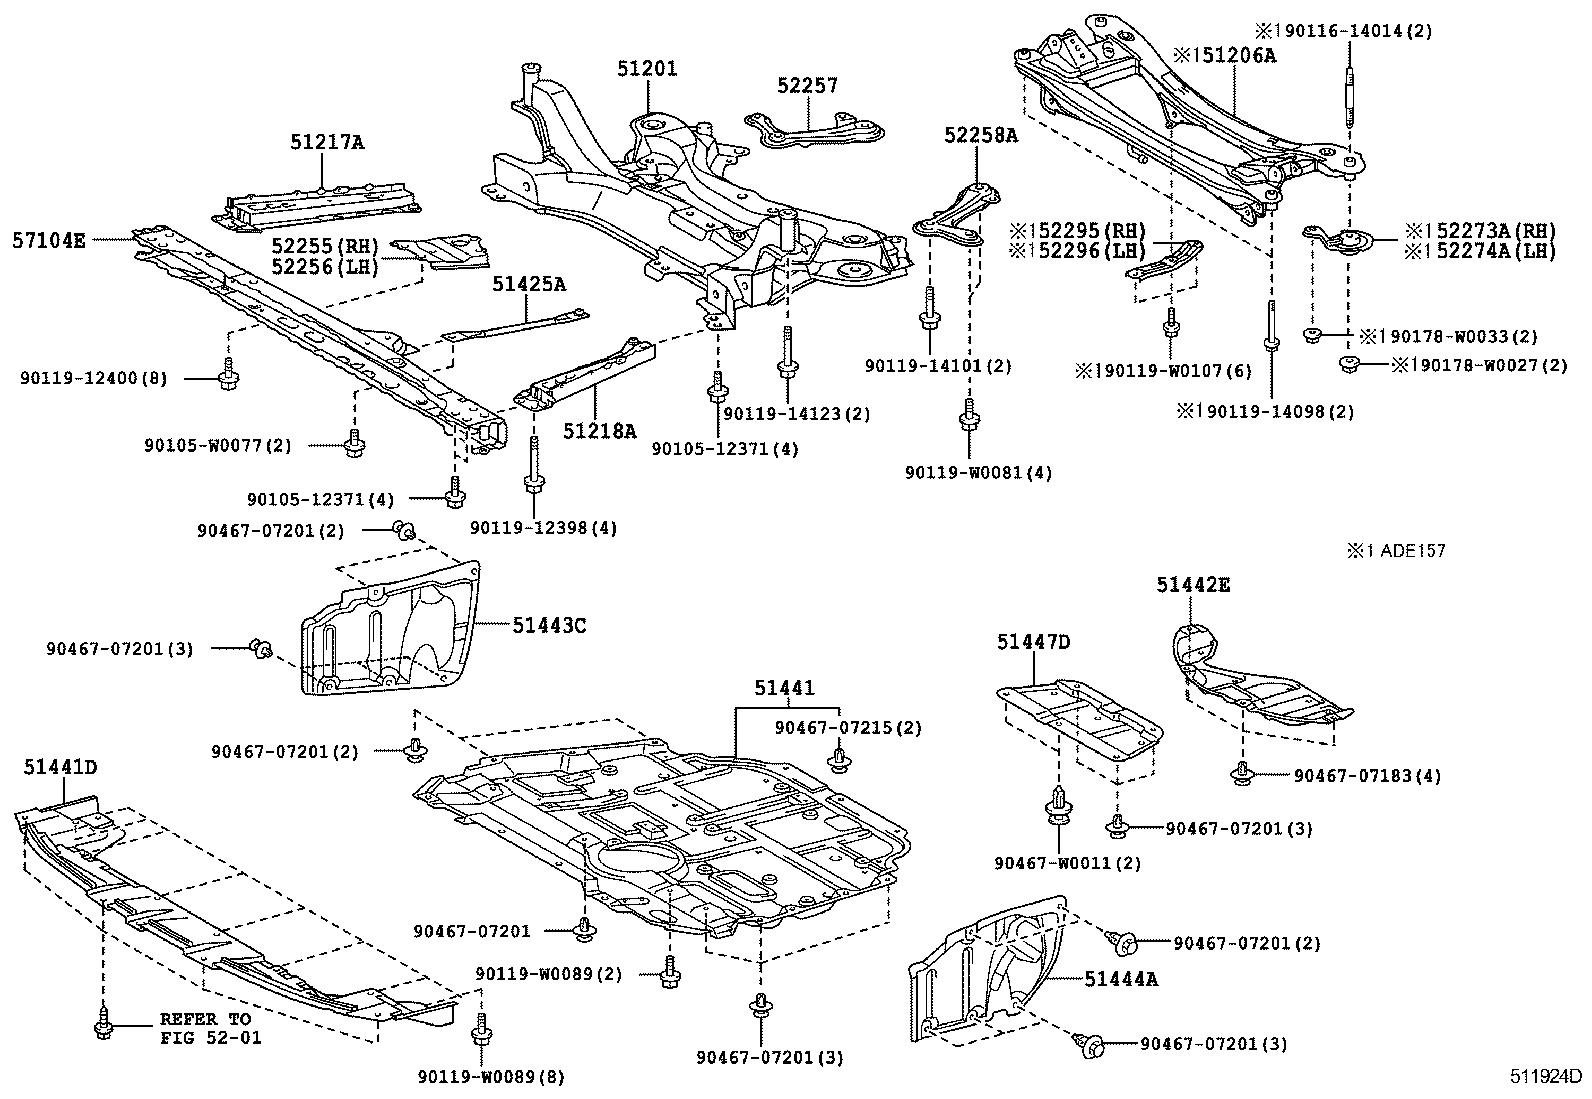 1971 toyota land cruiser parts